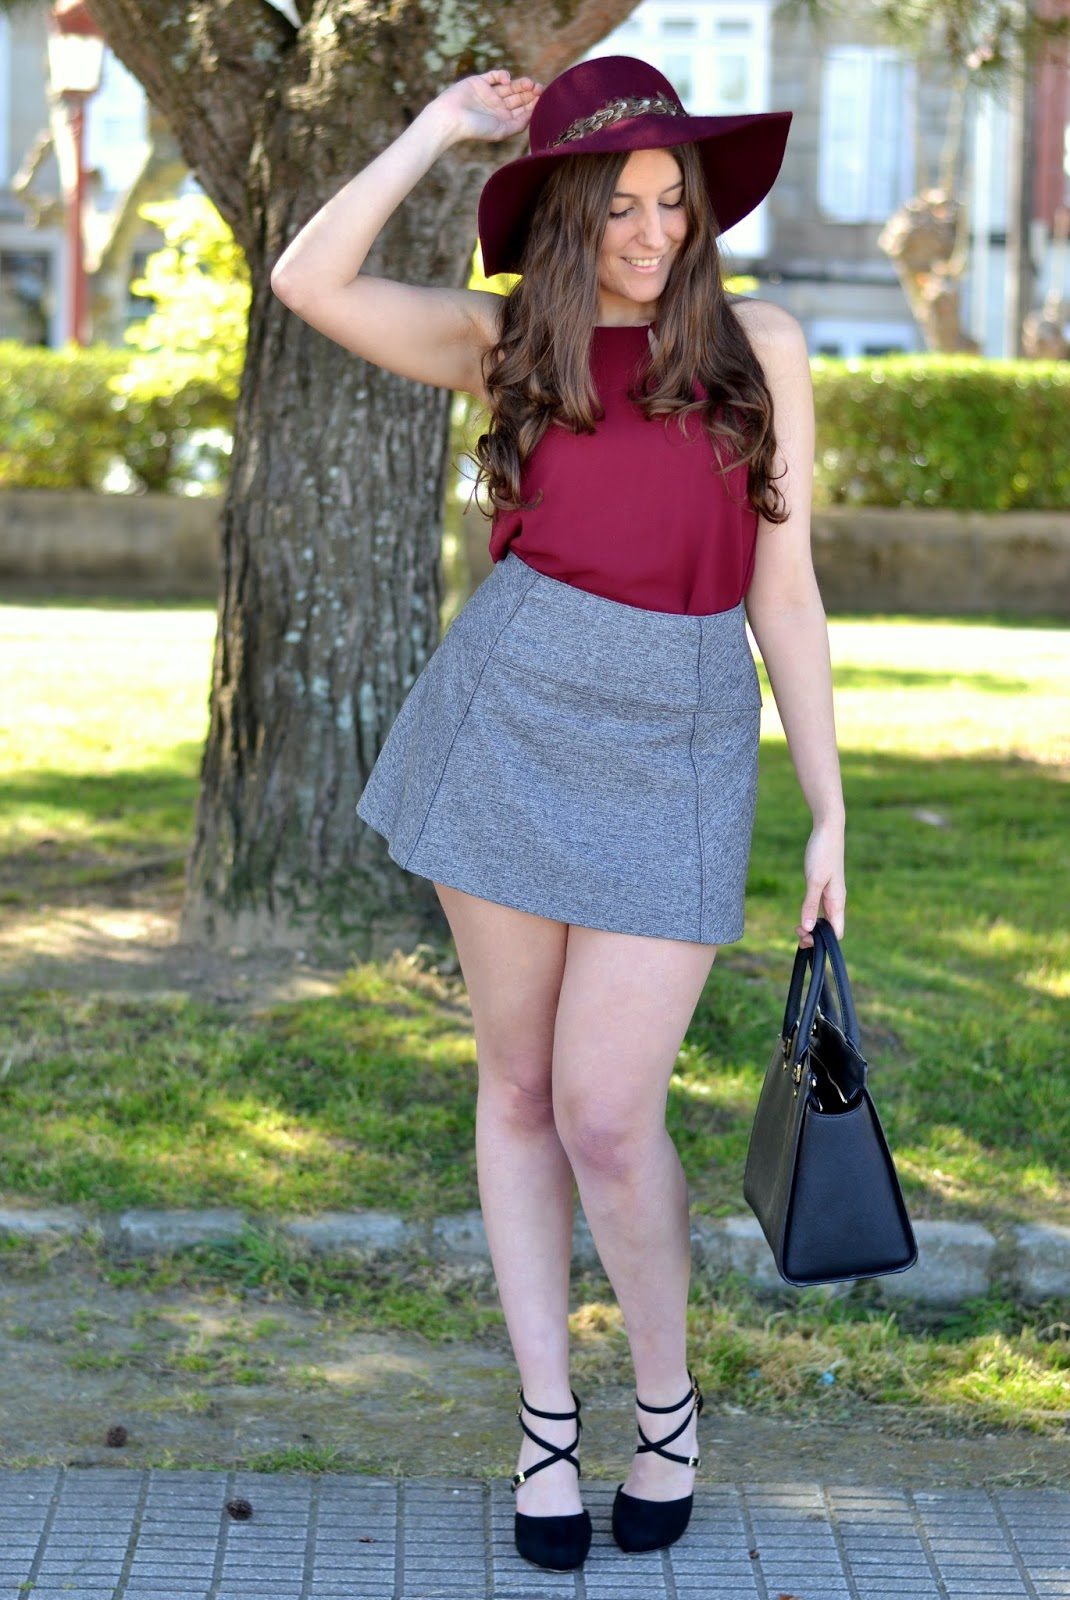 falda gris, top burgundy, sombrero, selma